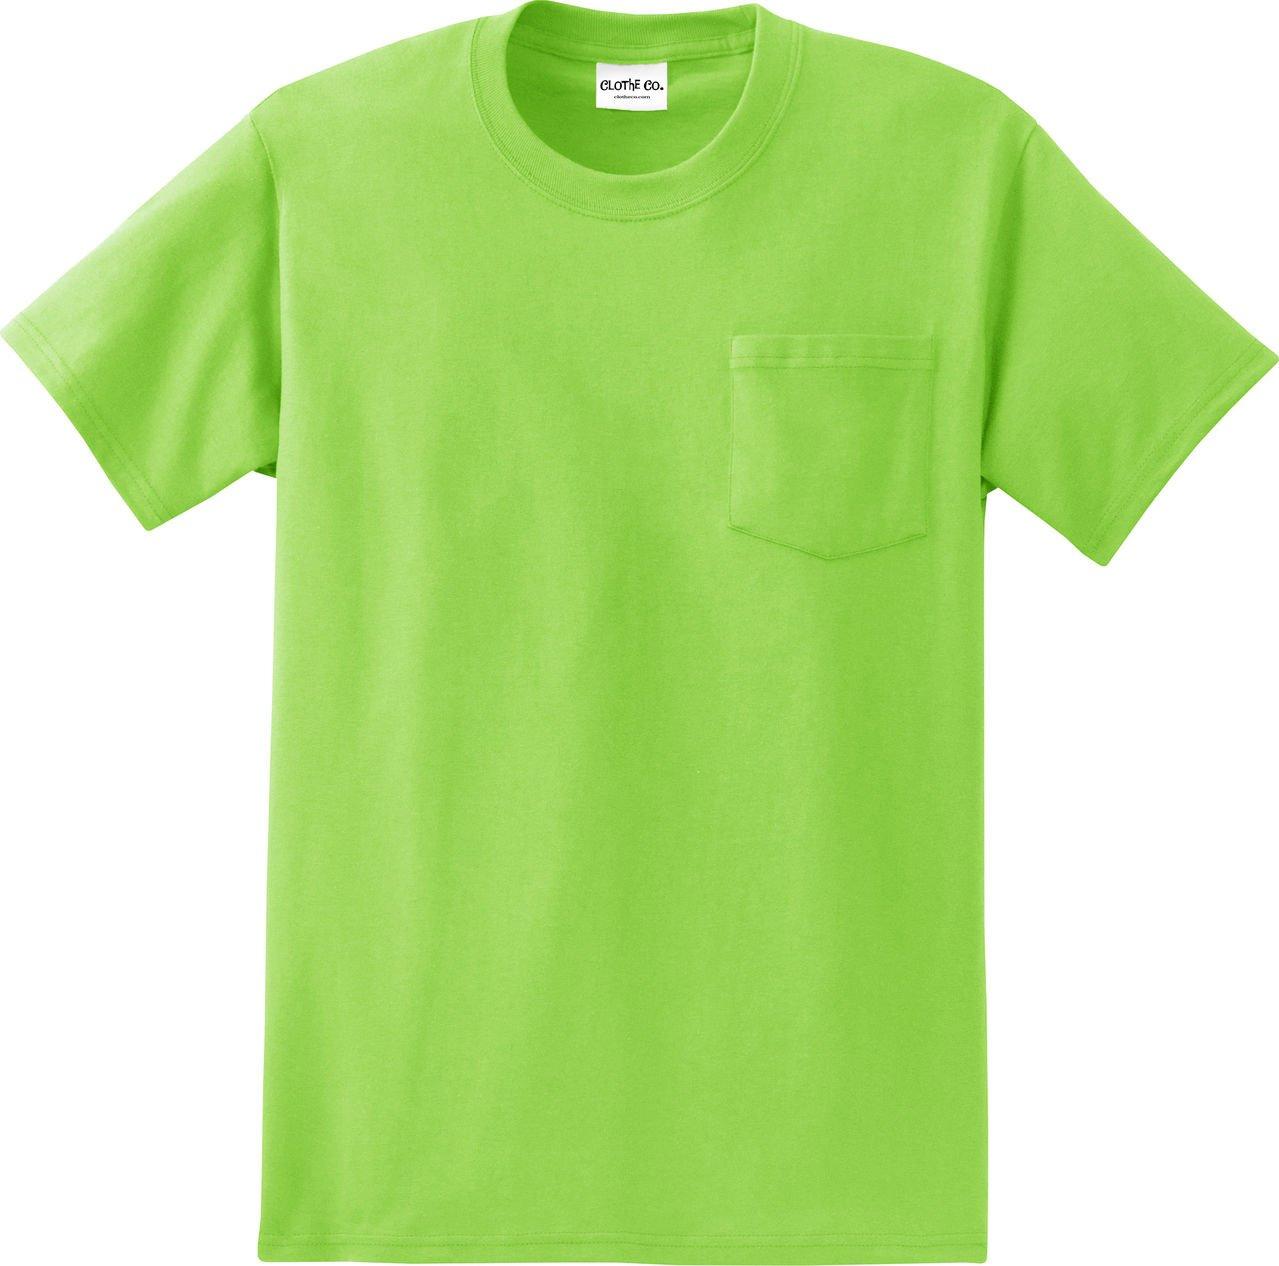 Clothe Co。メンズHeavyweight 100 %コットン半袖ポケットTシャツ B01BK6X8II 5L|ライムグリーン ライムグリーン 5L